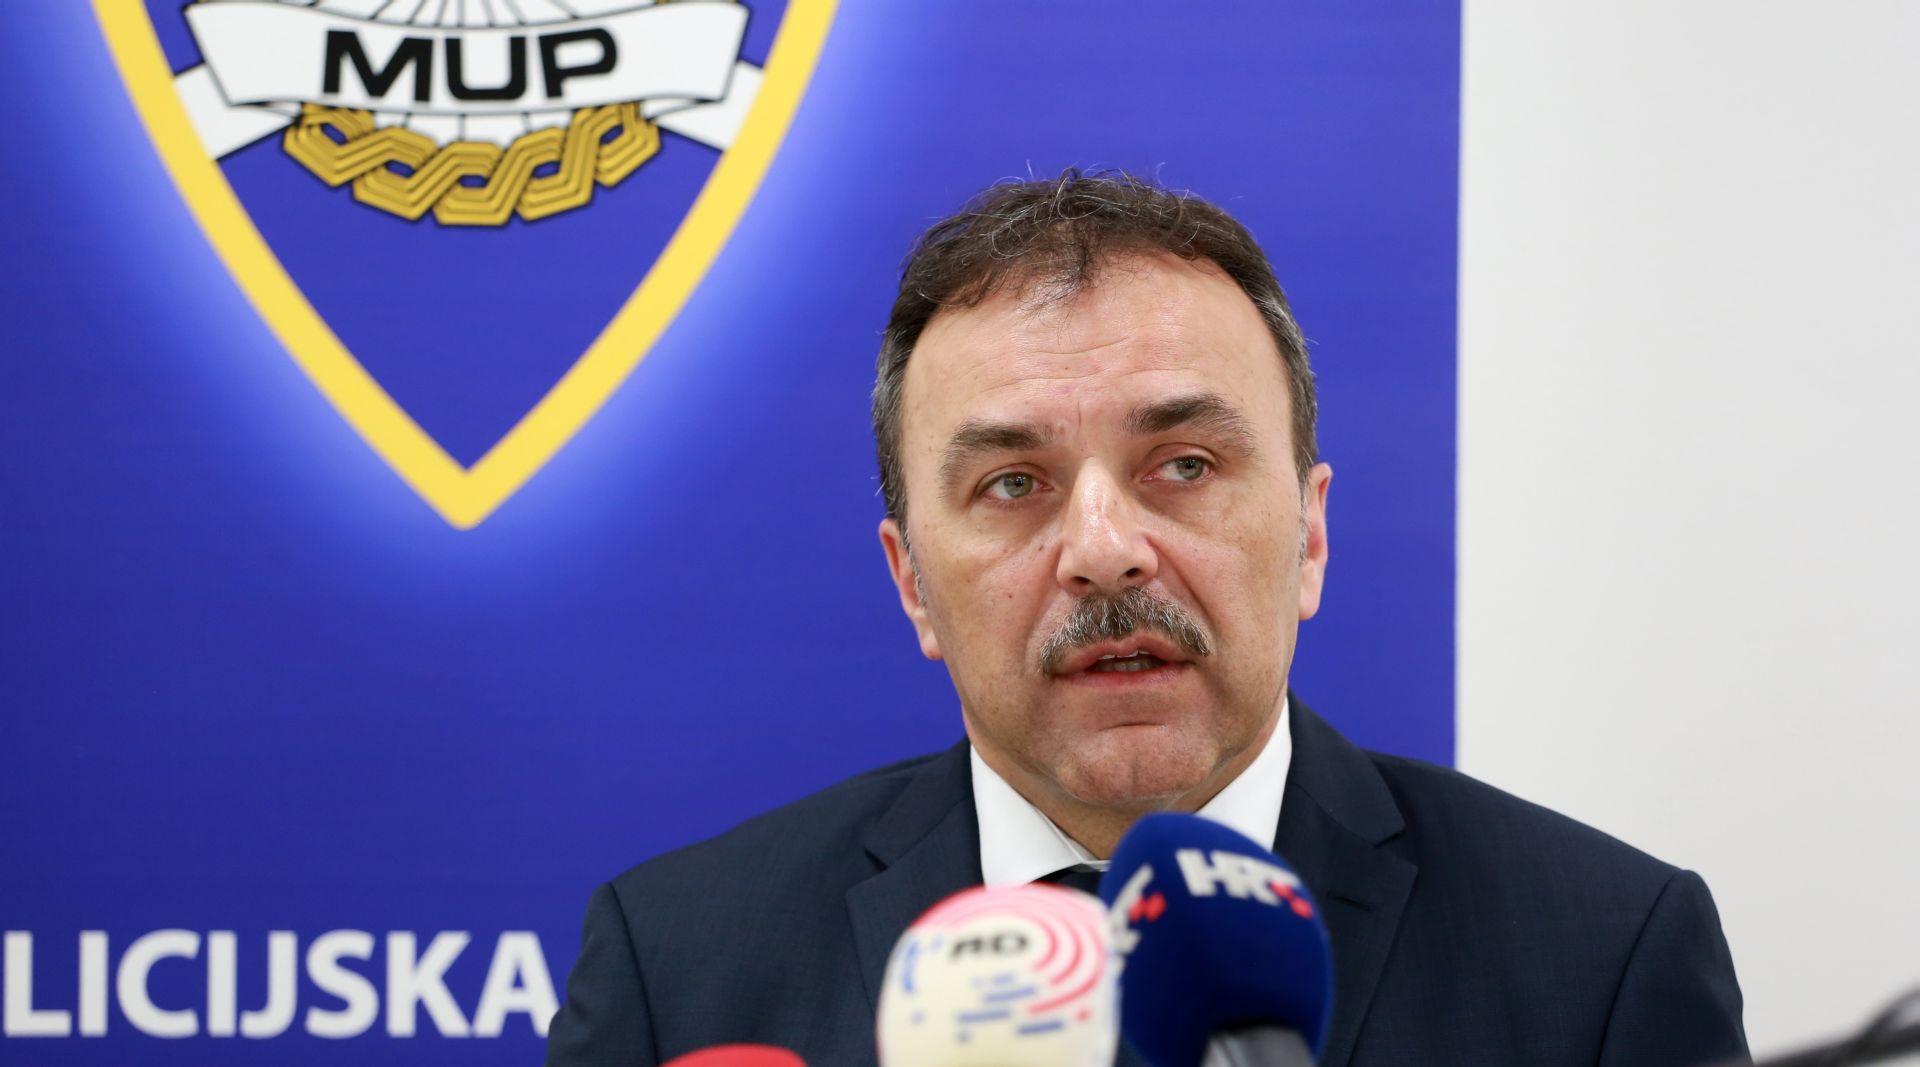 Otkazan sastanak Orepića i mađarskog kolege